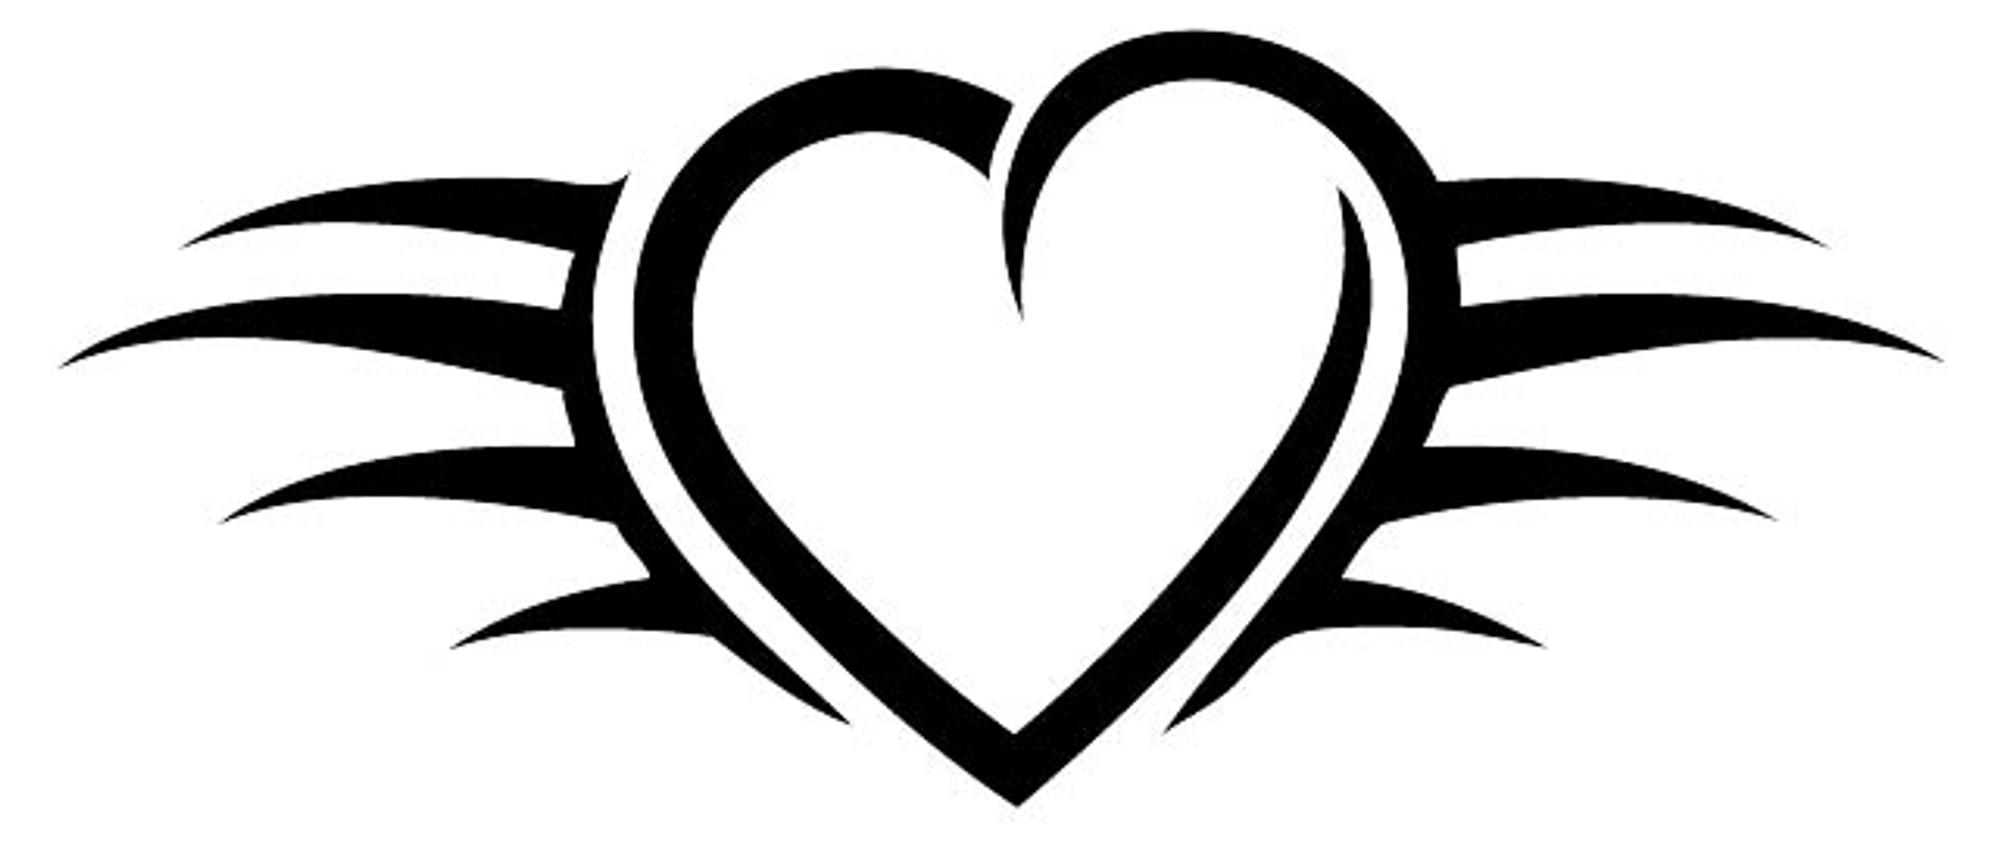 Heart Car Decals Car Stickers Heart Car Decal 04